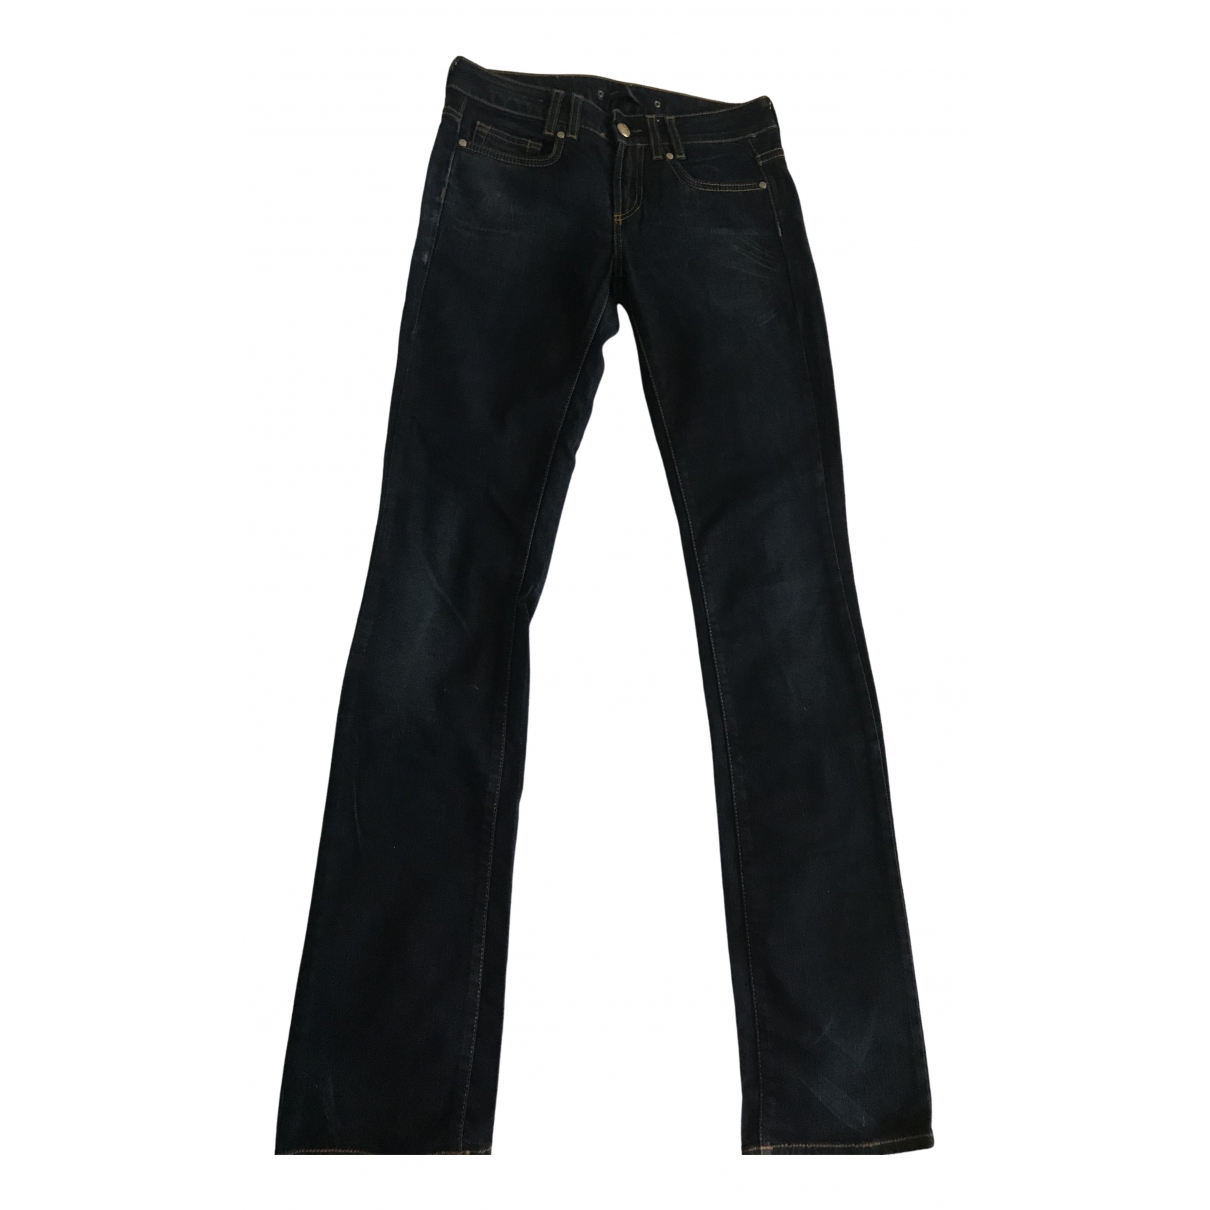 Gianfranco Ferré \N Navy Denim - Jeans Jeans for Women 39 FR